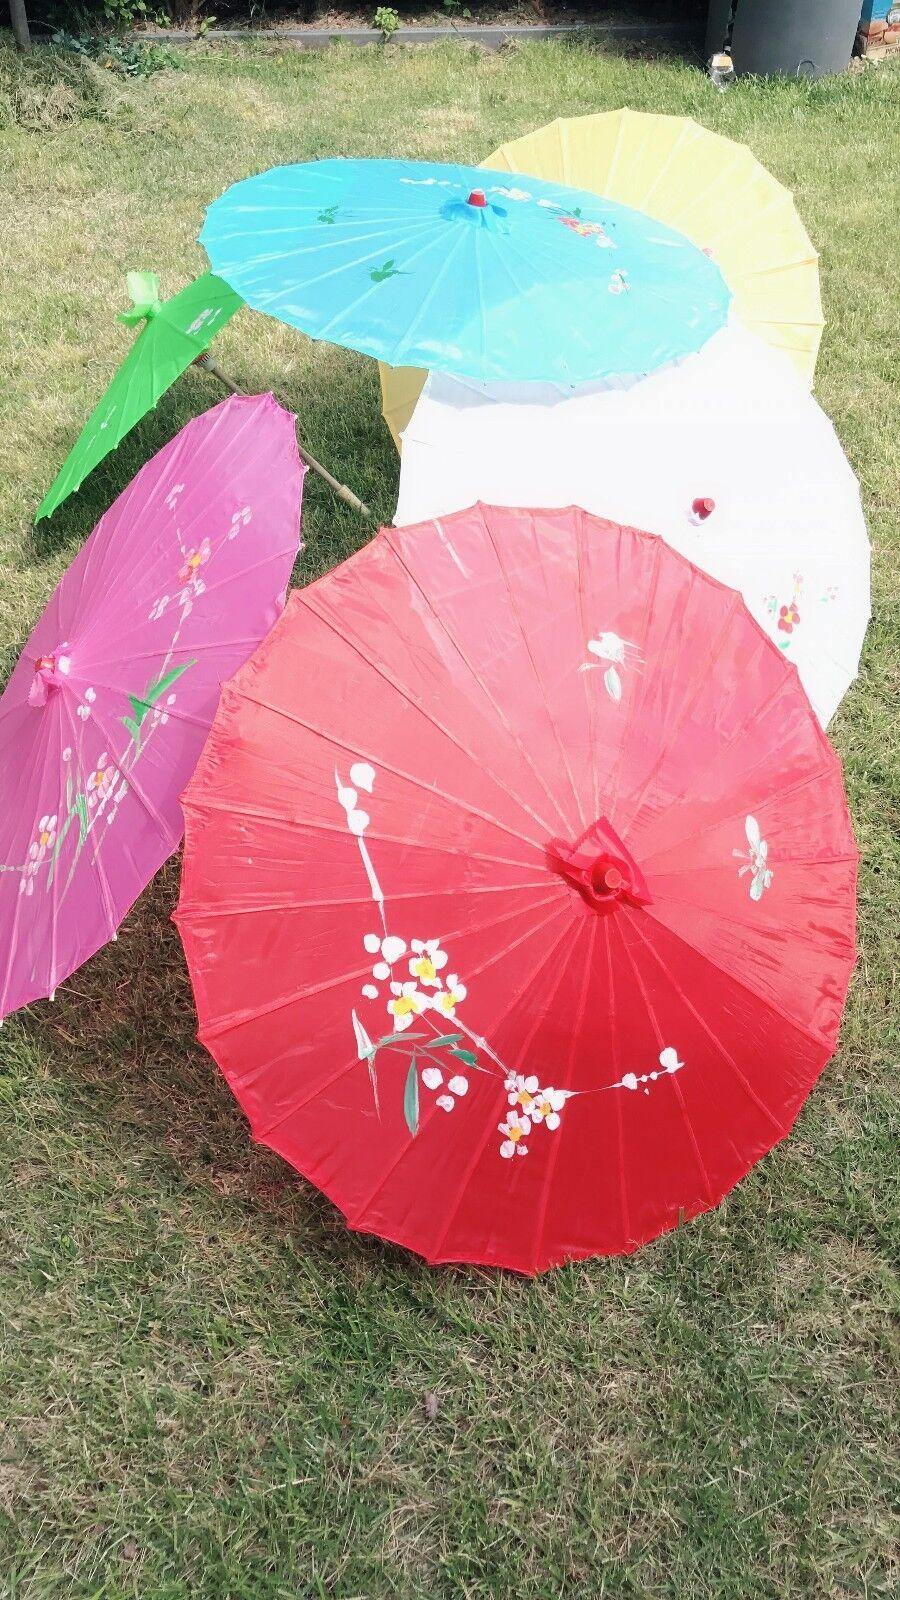 Lot of 12 MIX COLOR Flower Pattern Dancing Umbrella Parasol